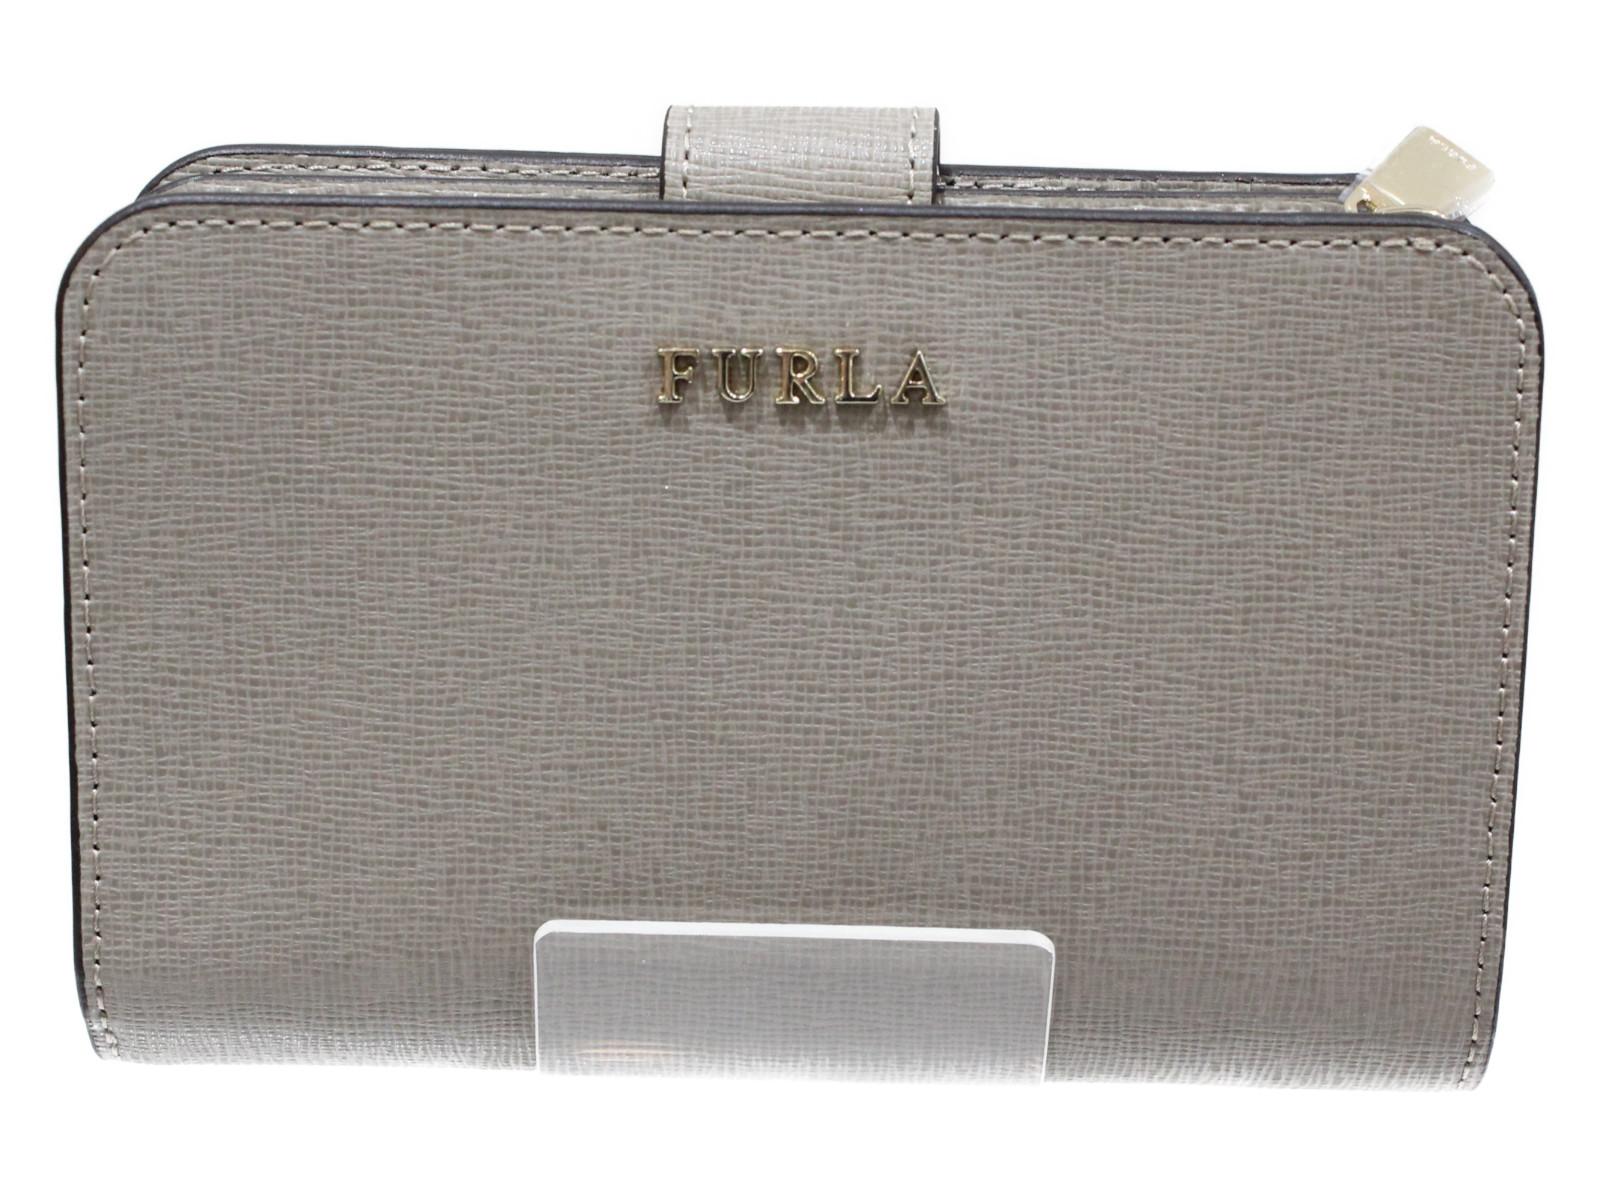 FURLA(フルラ)ジップアラウンドウォレット グレー小銭入れファスナー カワイイ プレゼント包装可【中古】